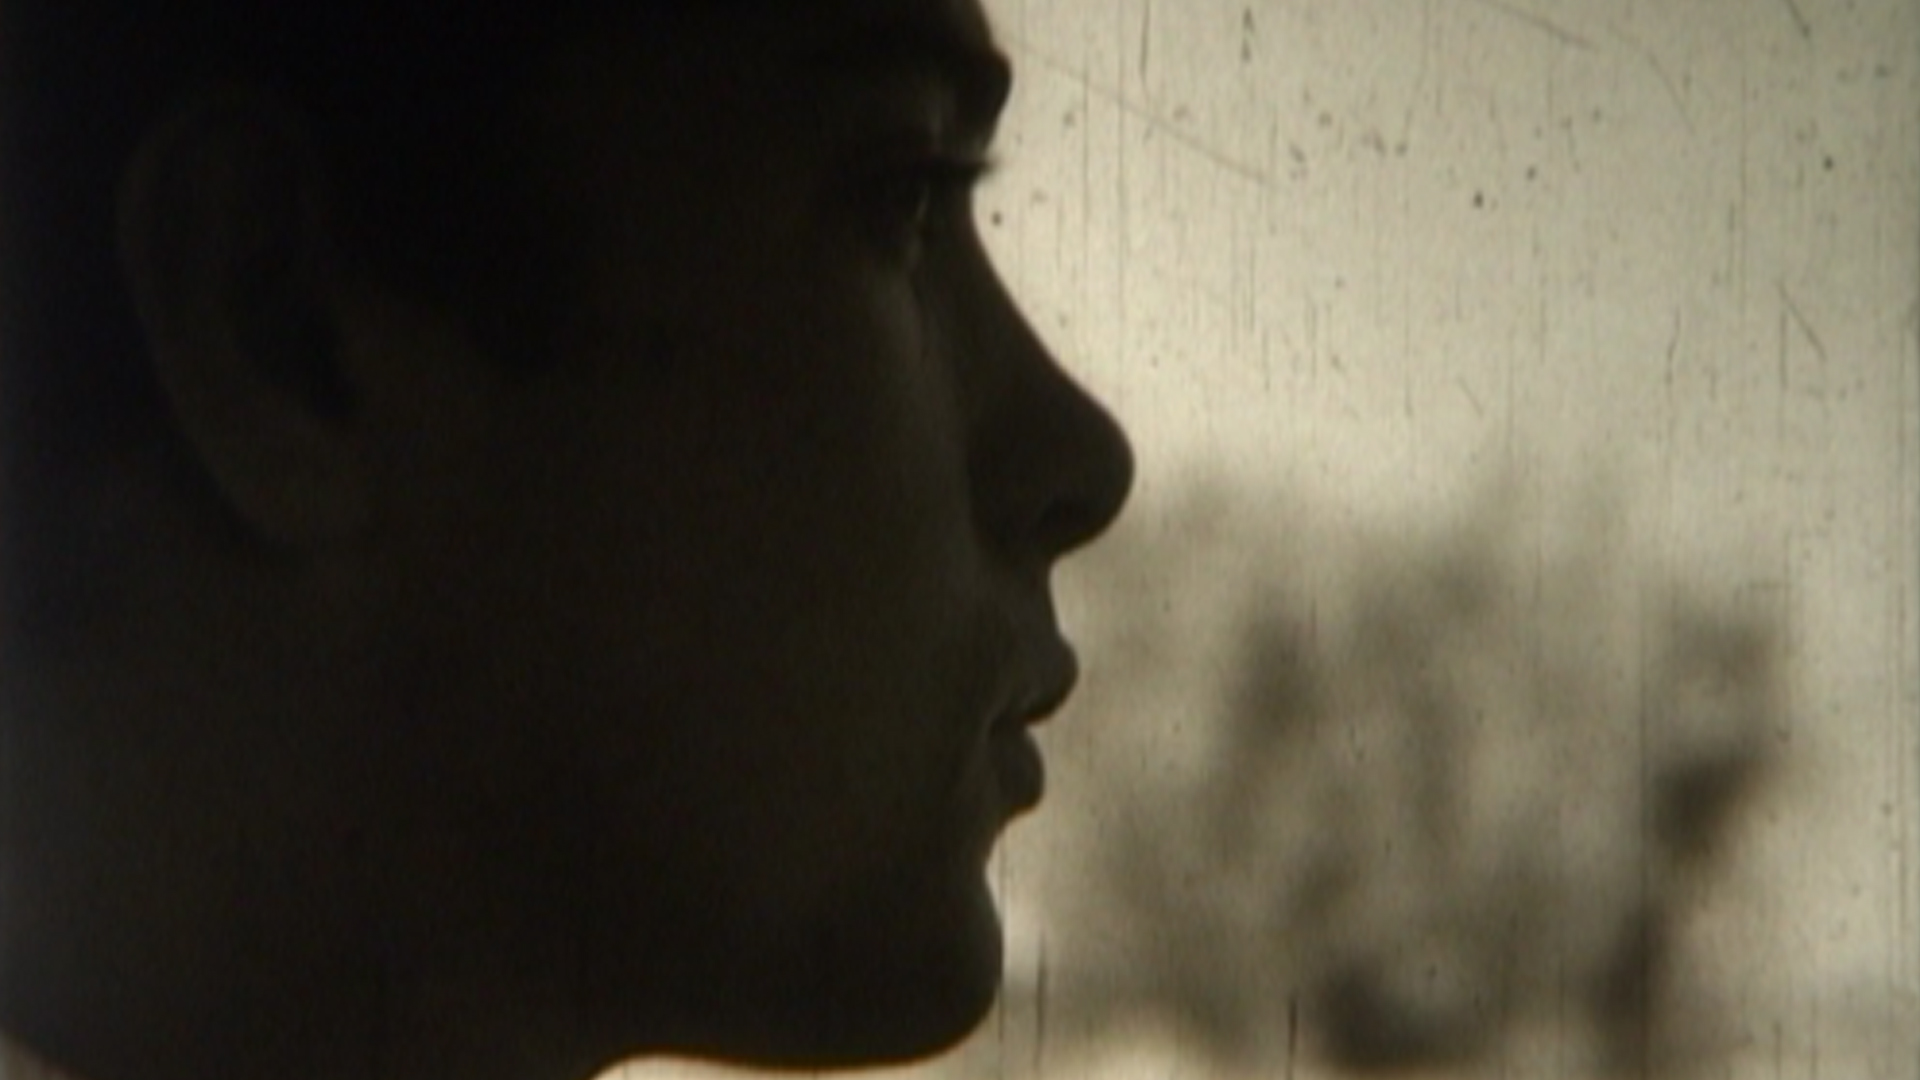 Temps documentaire adolescent américain va